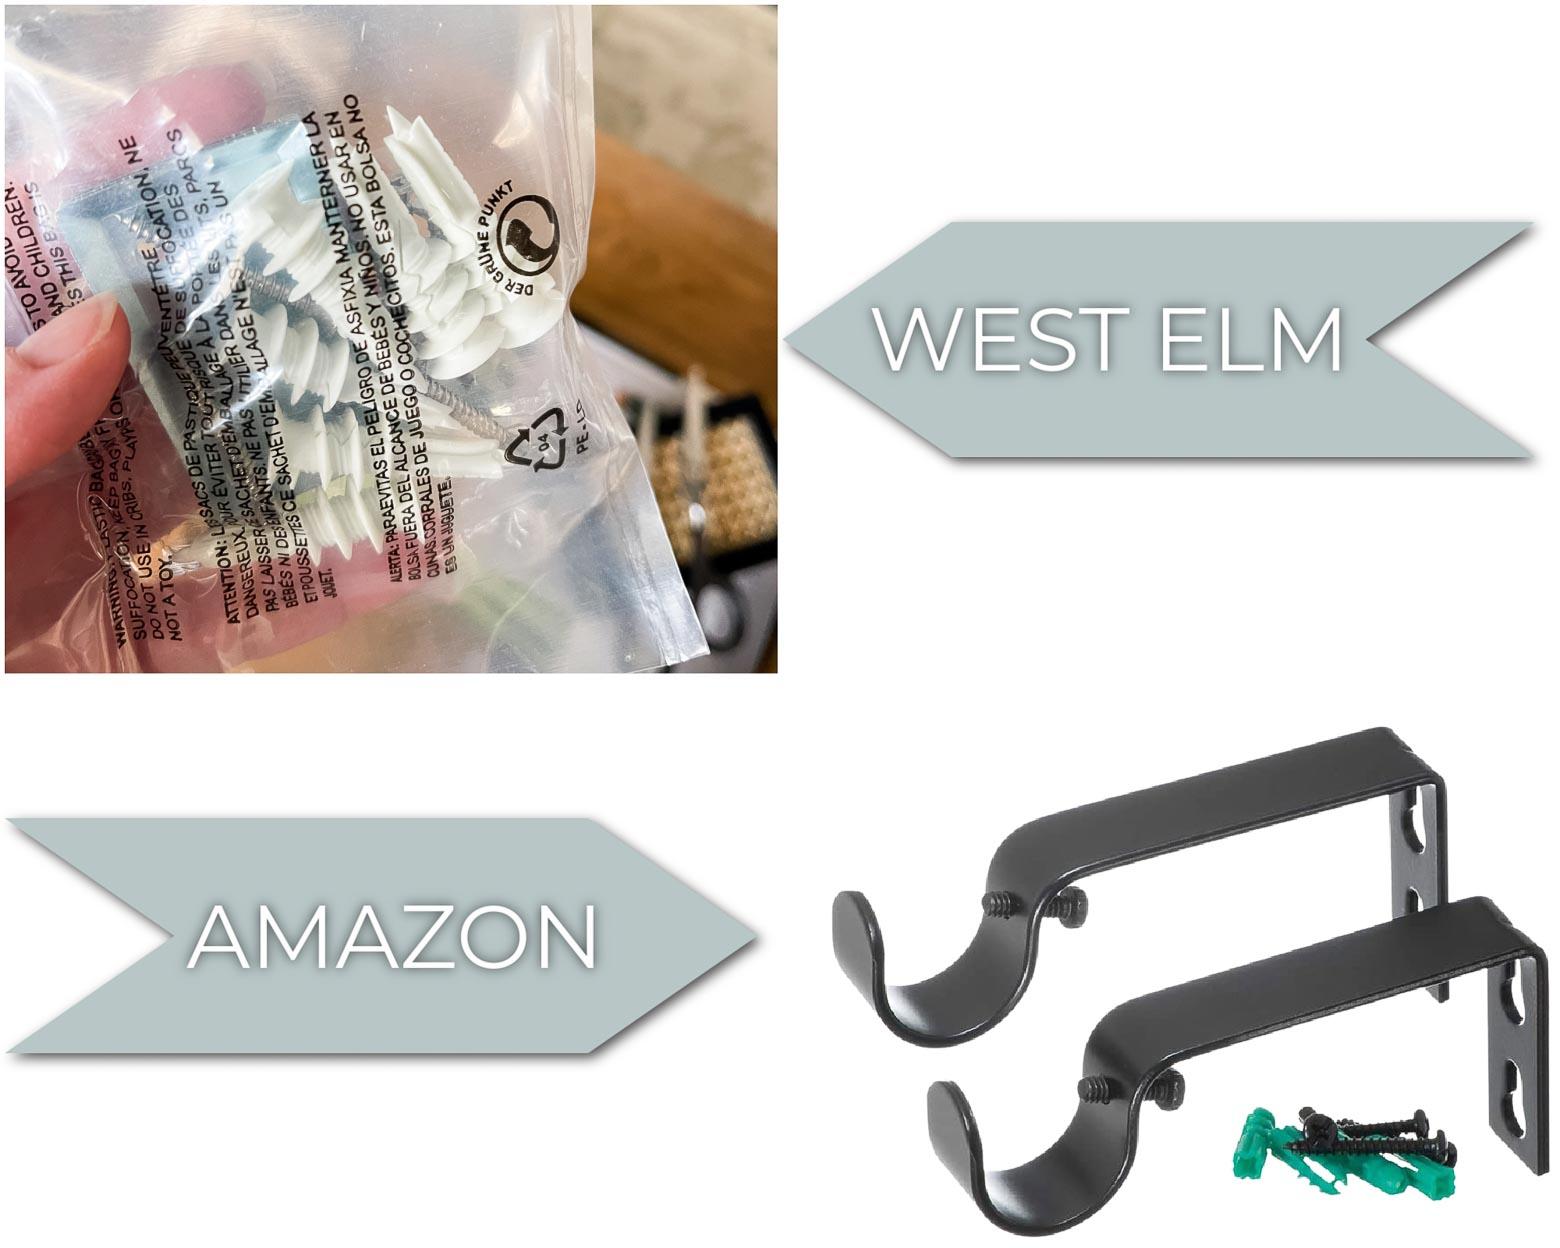 West Elm Curtain Rod Hardware vs. Amazon Modern Curtain Rod Hardware Comparison